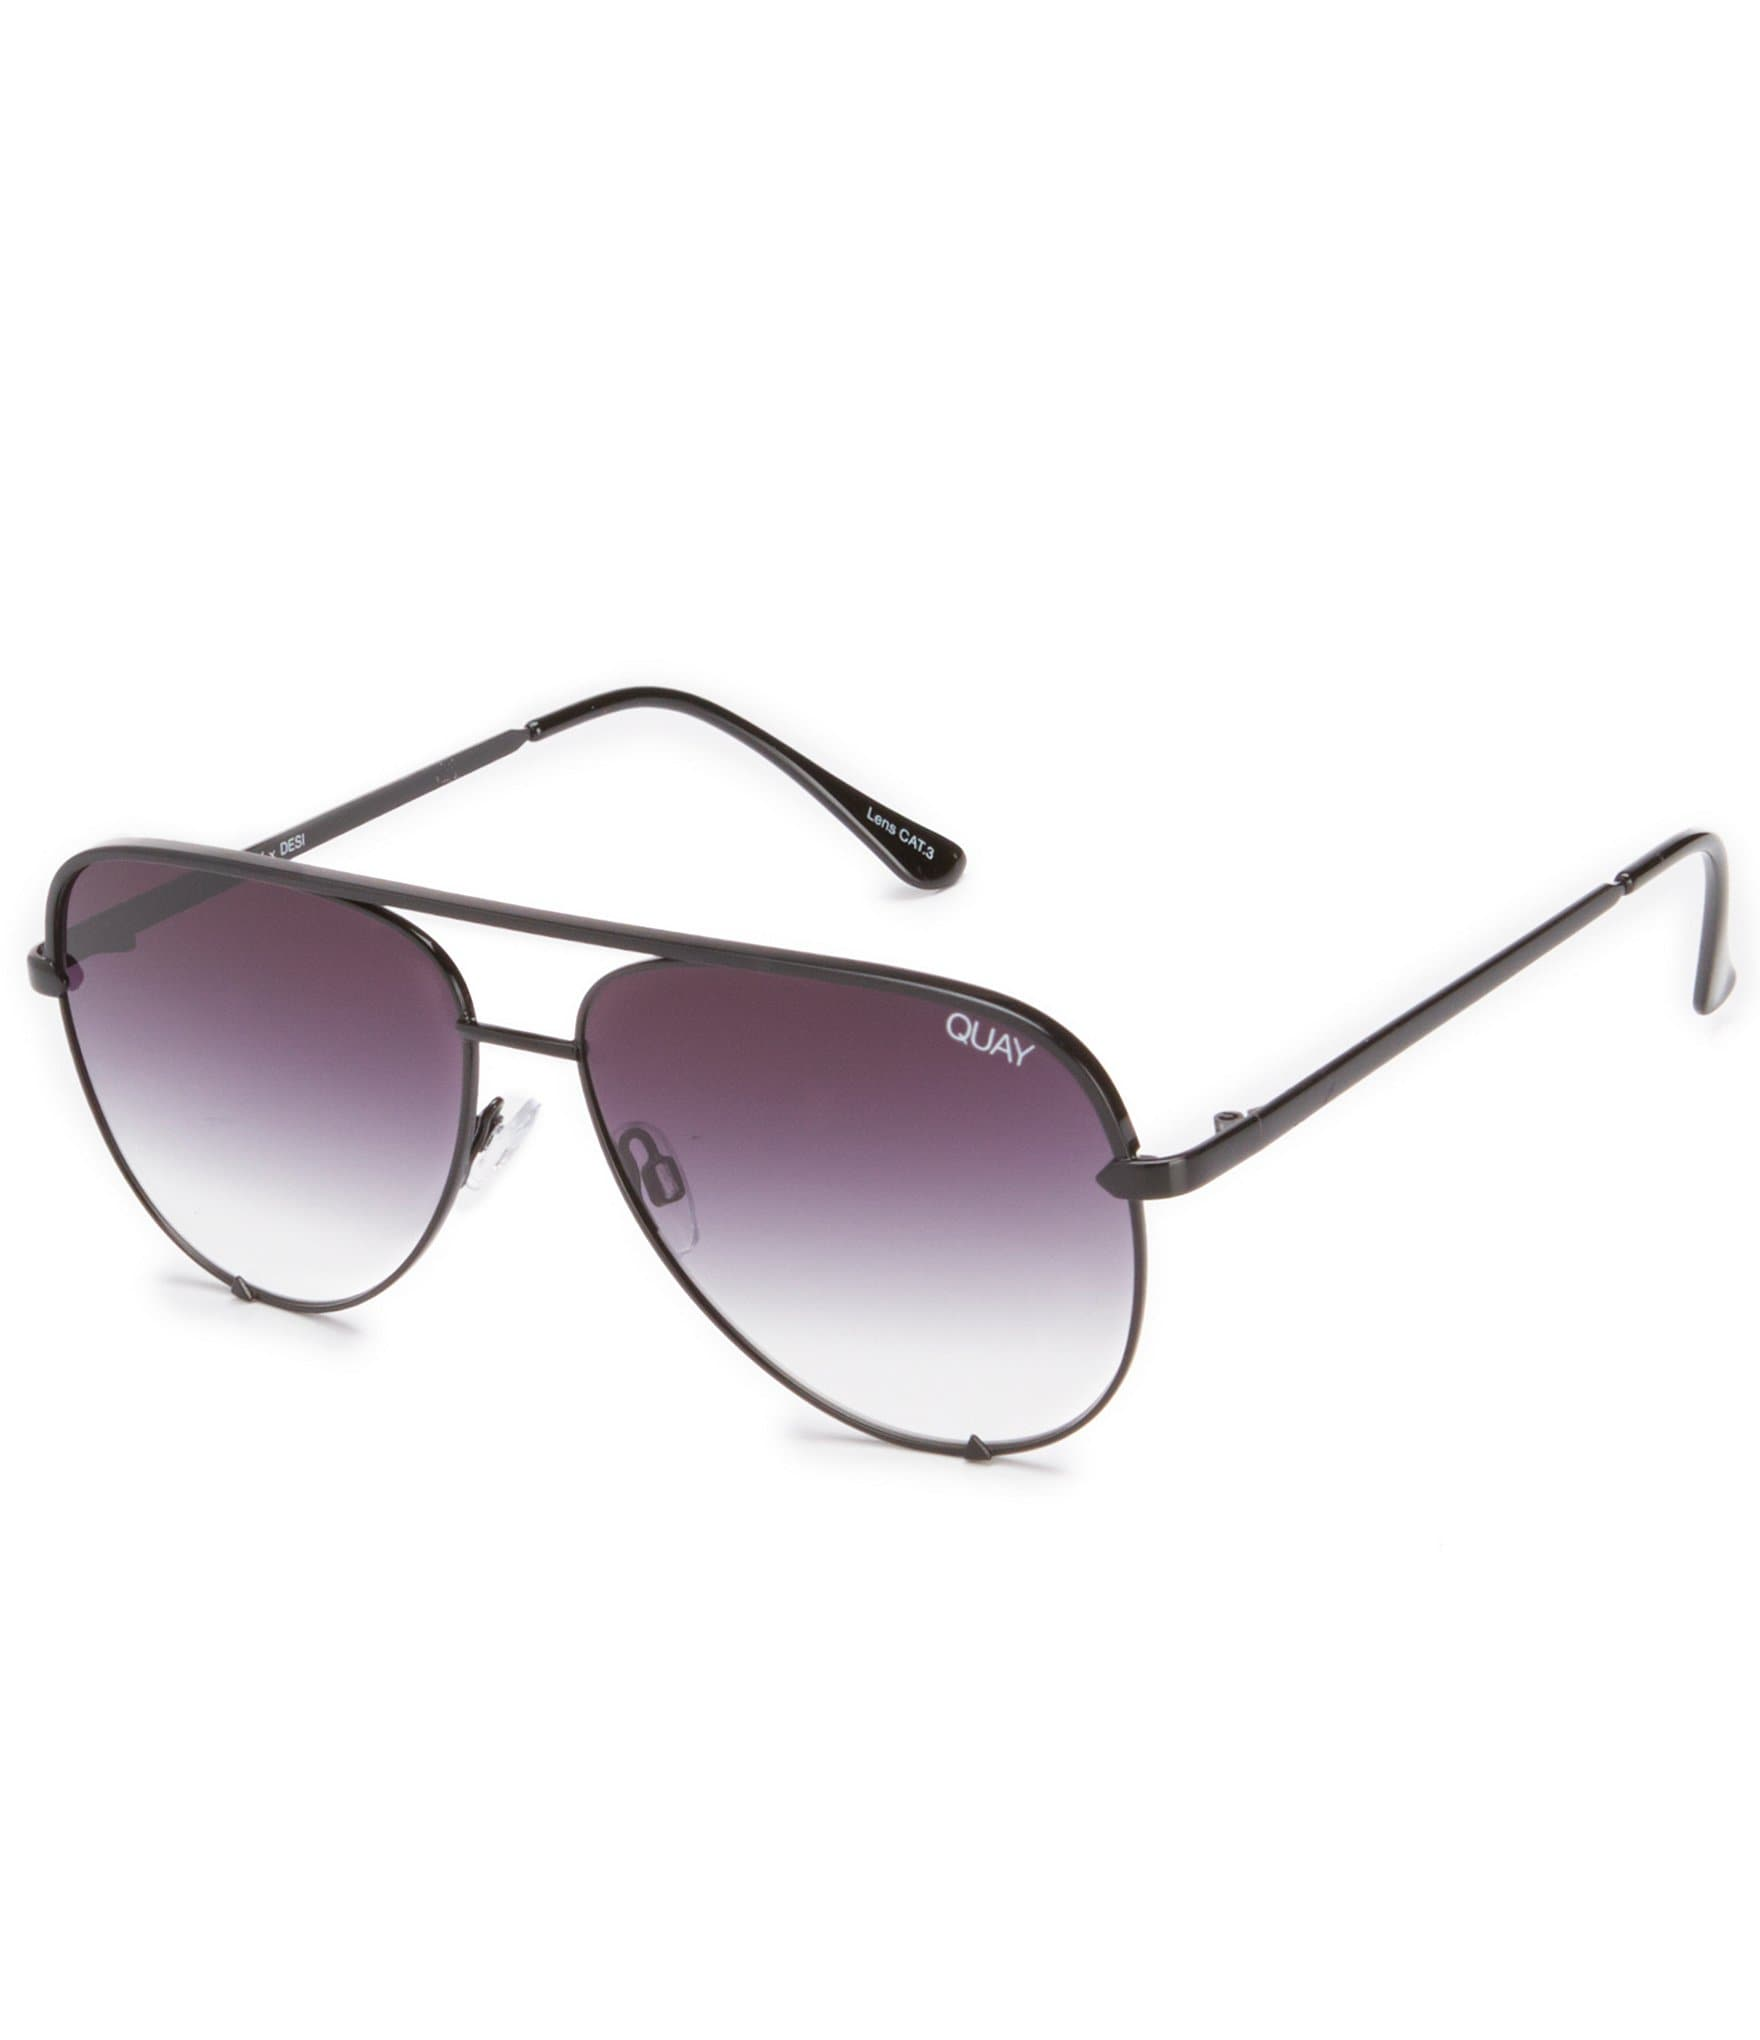 9e24603649c Quay Australia Sunglasses   Eyewear